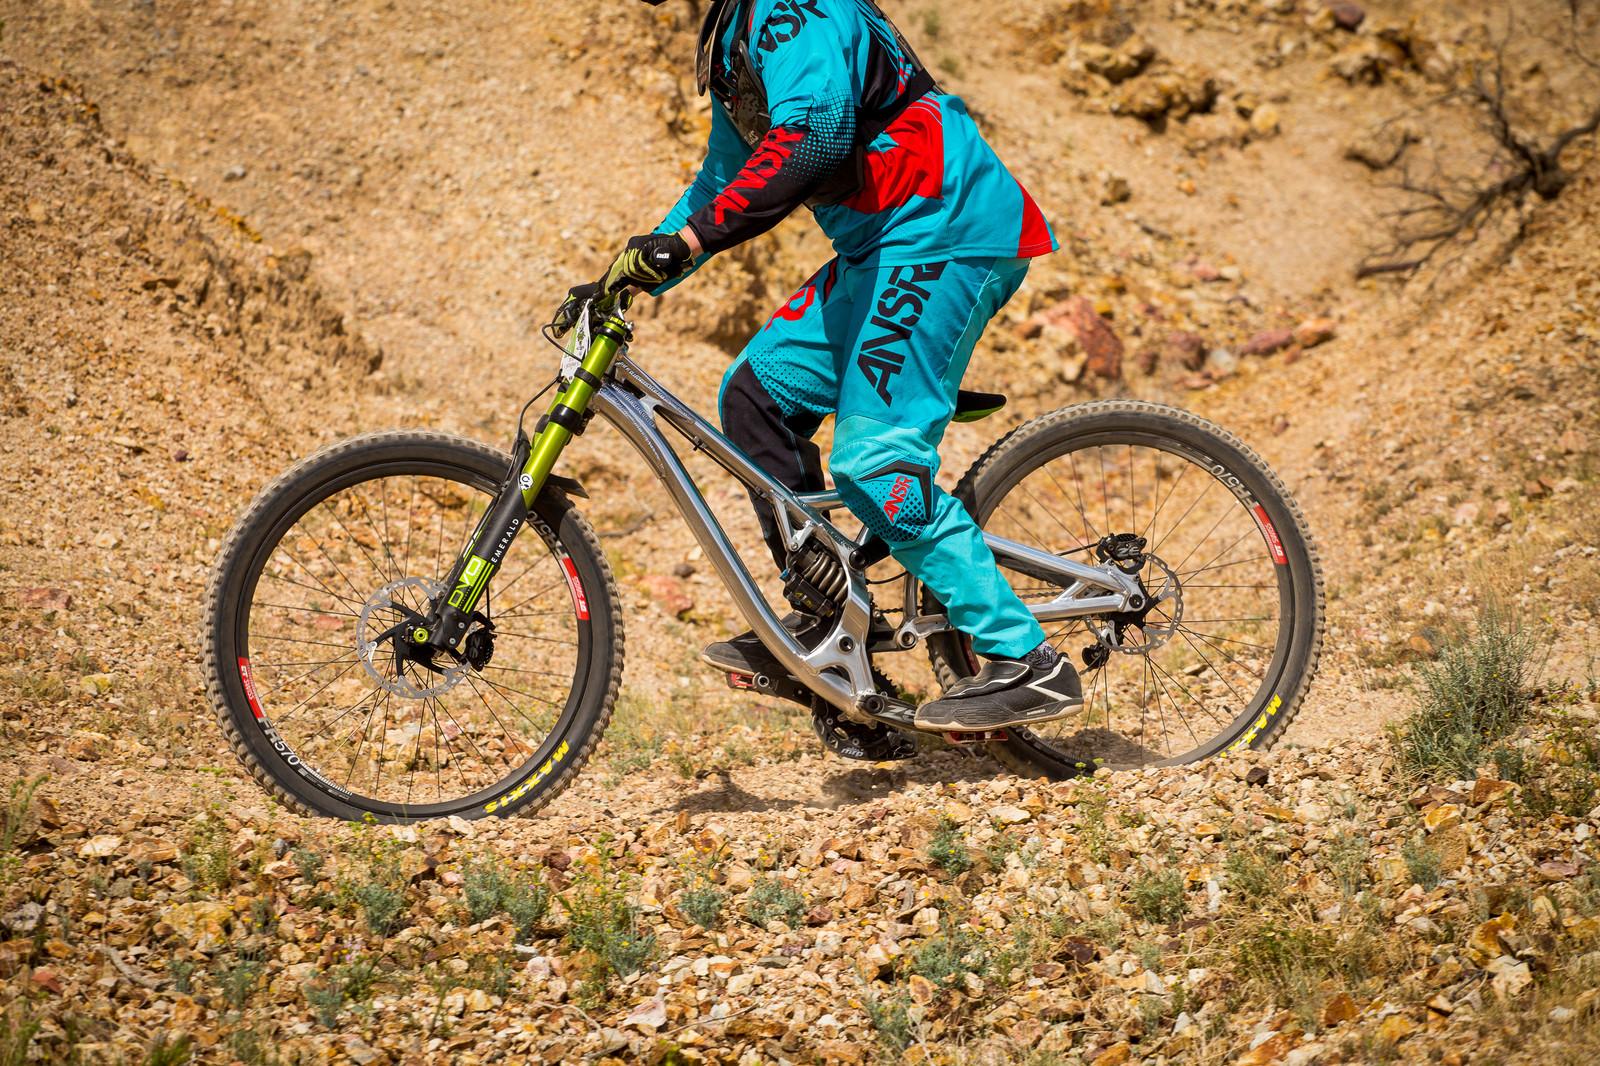 2017 Reaper Madness DH at Bootleg Canyon Photos - 2017 Reaper Madness DH Photos - Mountain Biking Pictures - Vital MTB